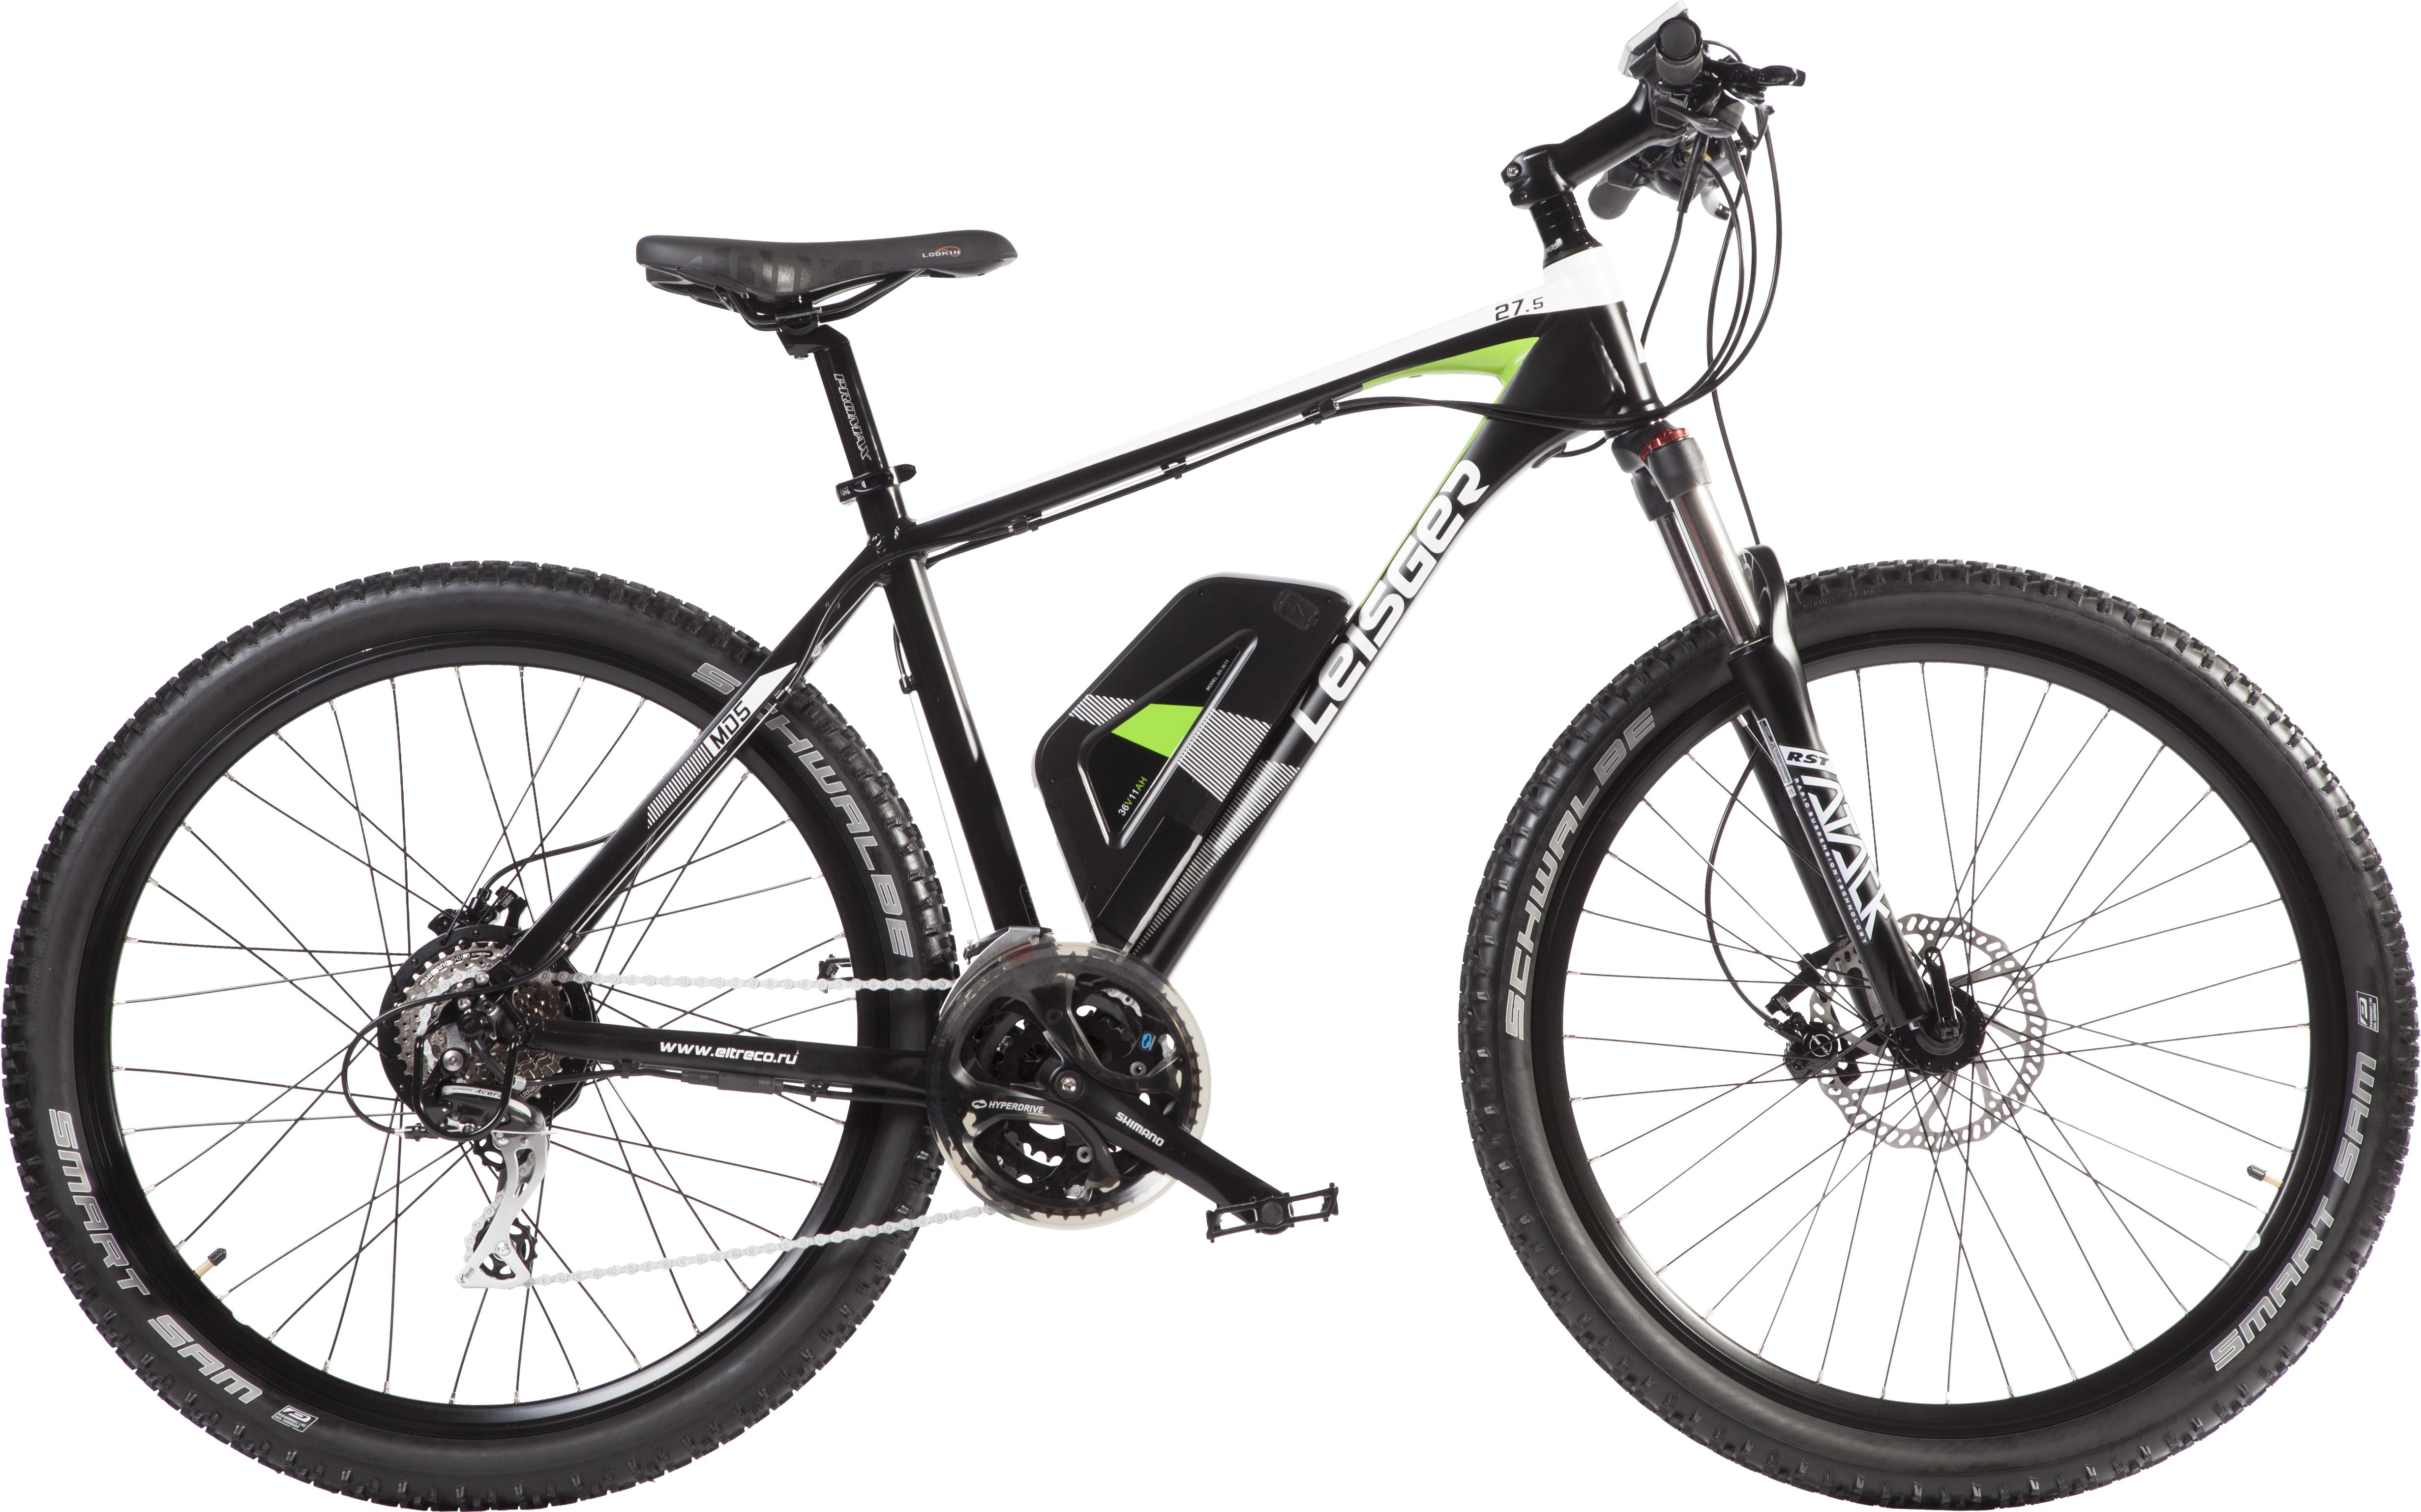 Купить Велогибрид ELTRECO LEISGER BASIC MD5-650-B+MB 361175WG16 black/green, Велогибриды, 1327526